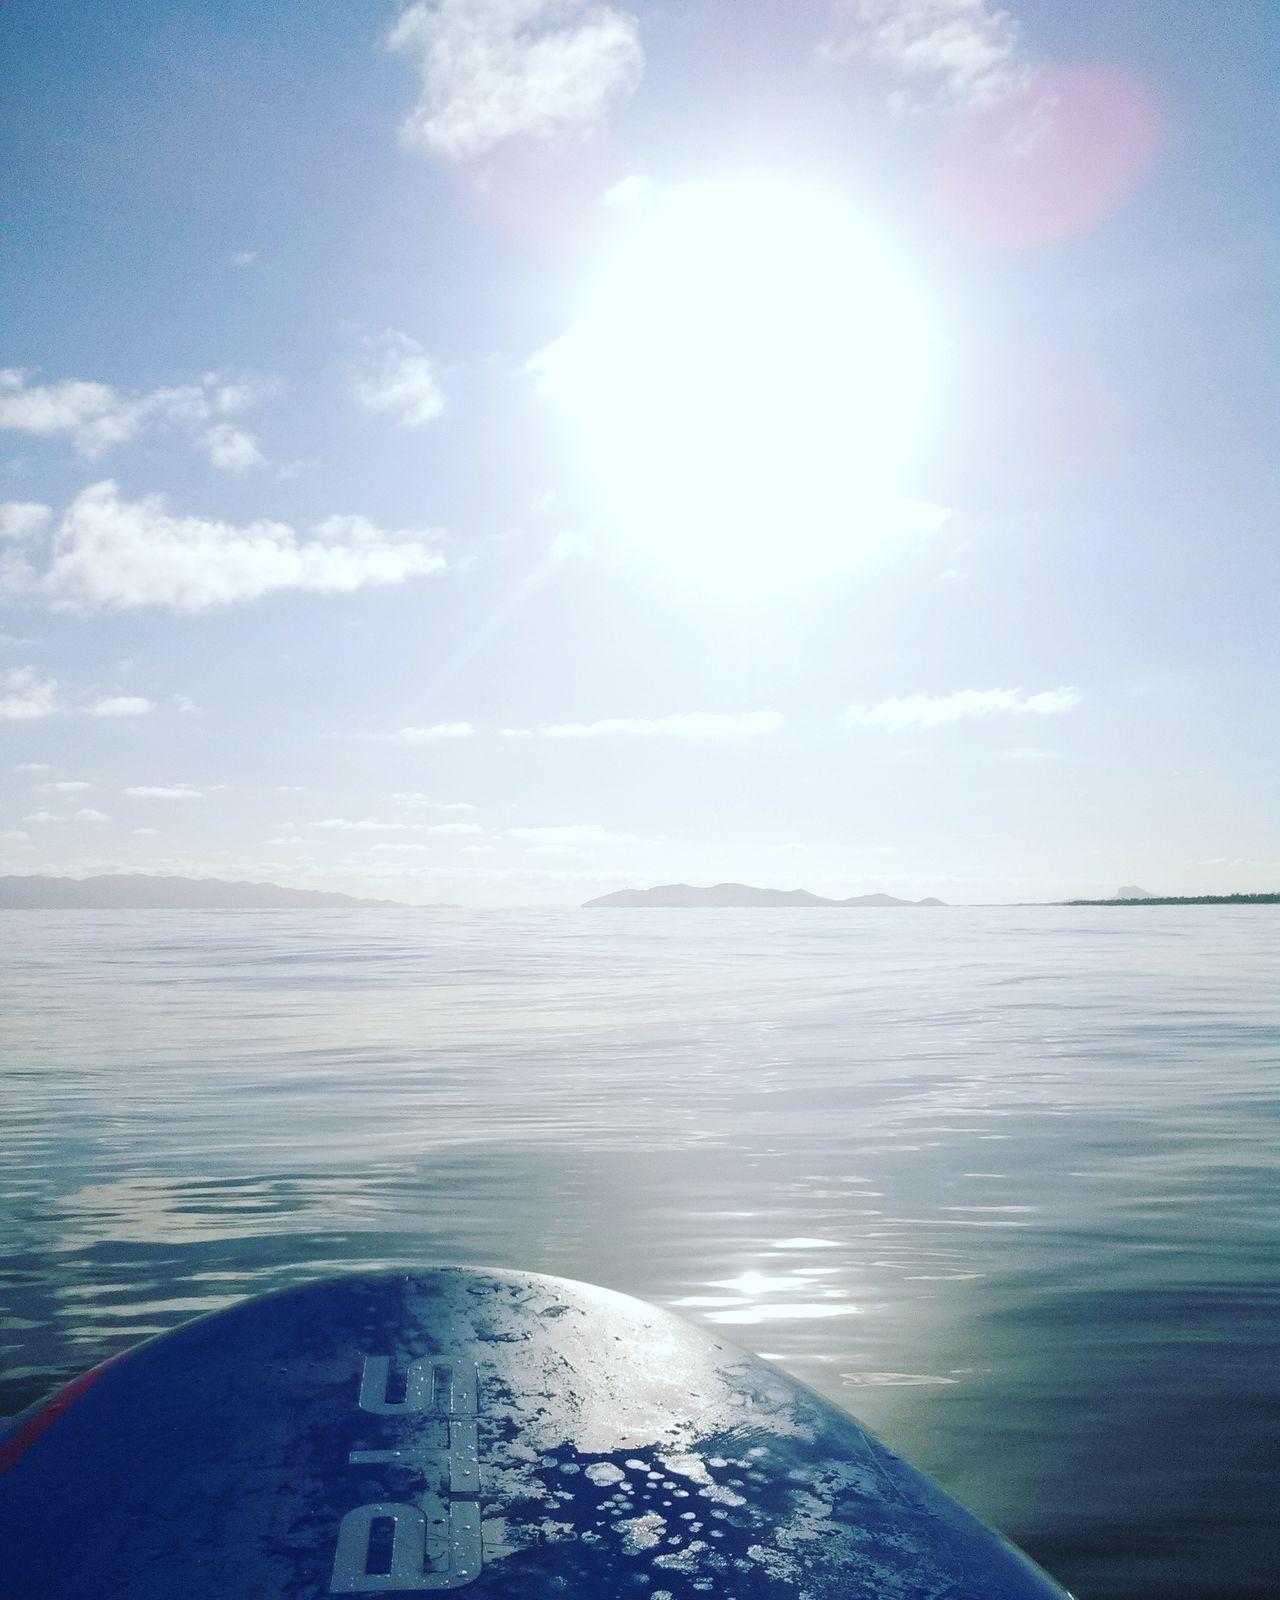 Starboardsup Starboard StandupPaddleBoard Standuppaddling Standup Paddleboarding Sup Sunrise Magnetic Island Queensland Australia Australia Ocean Sea Sea And Sky Water Sky Outdoors Nature Scenics EyeEmNewHere Seascape HTC Android EyeEmNewHere